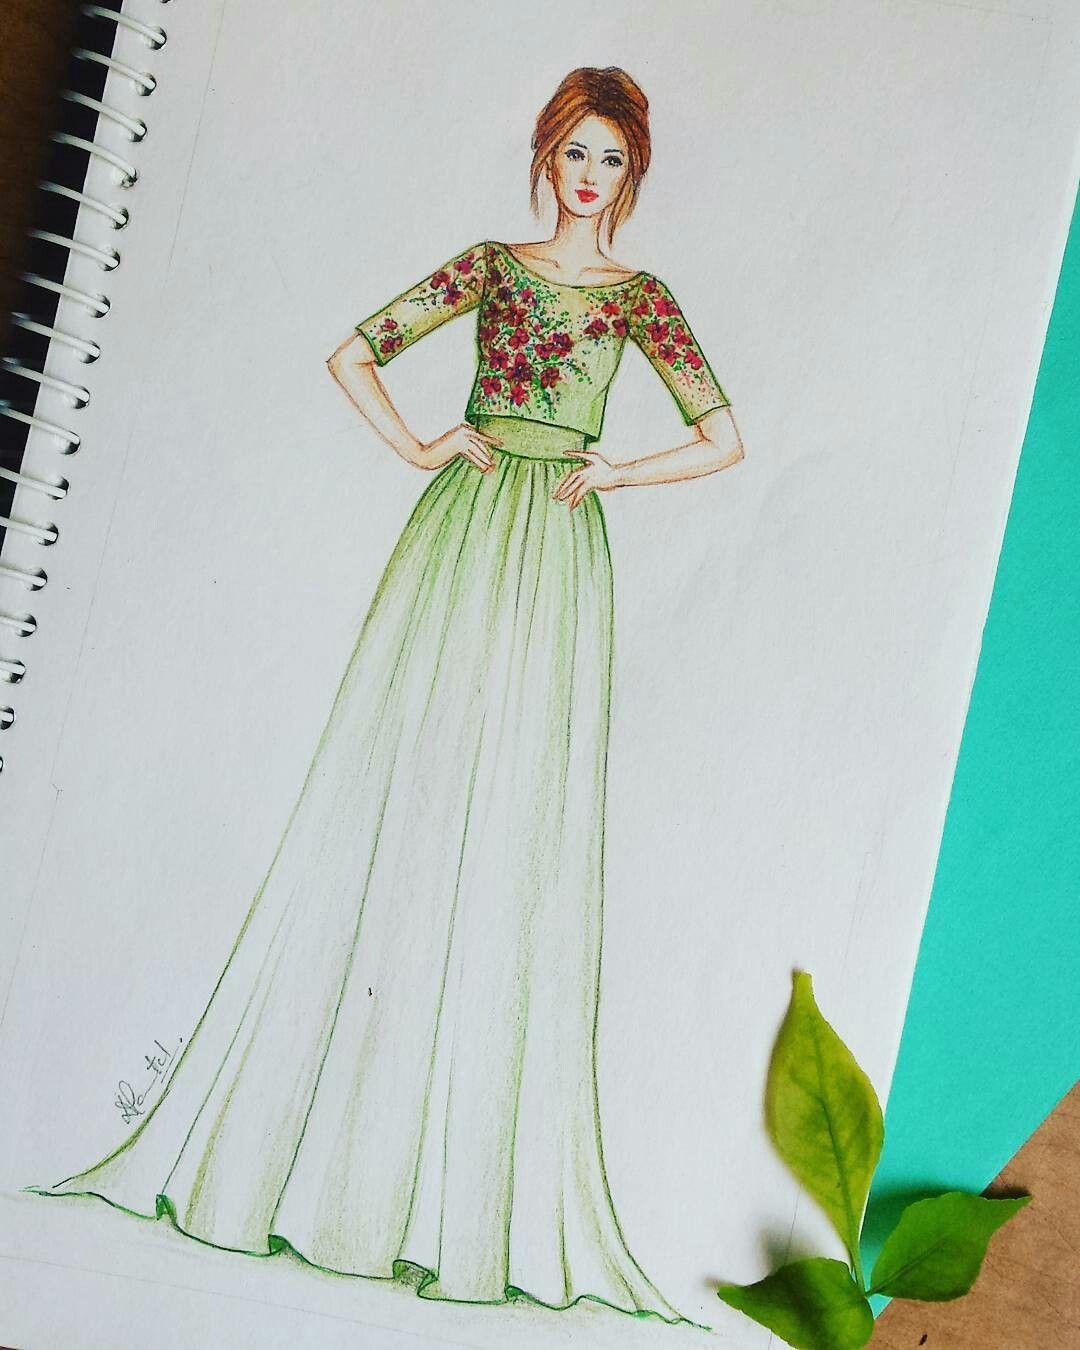 Pin By Manvi Verma On Awesome Art Illustration Fashion Design Dress Design Sketches Fashion Illustration Sketches Dresses